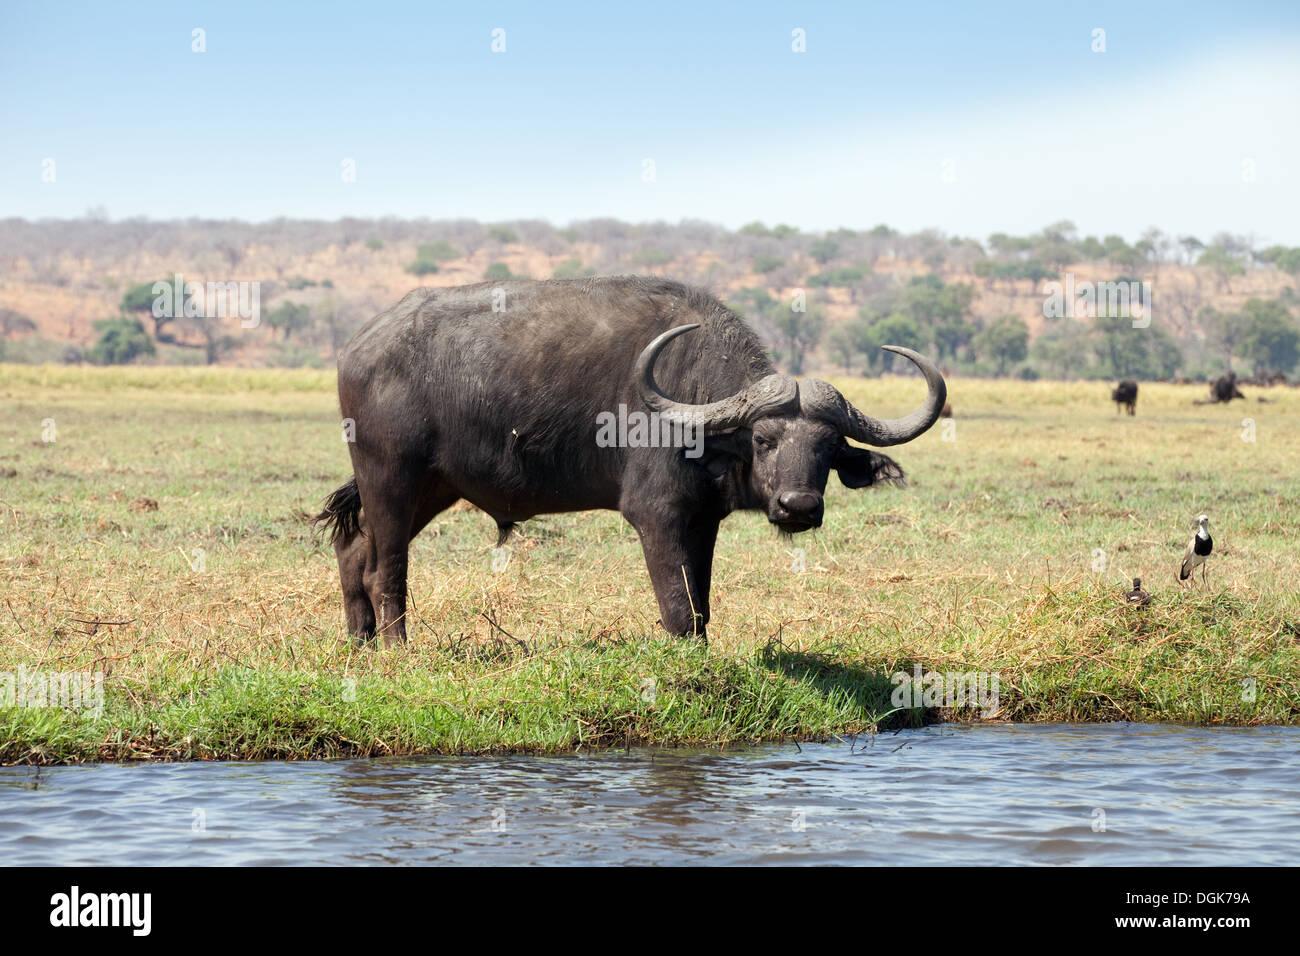 Africa buffalo - Male African buffalo bull, ( Syncerus caffer ), Chobe National Park, Botswana Africa - Stock Image